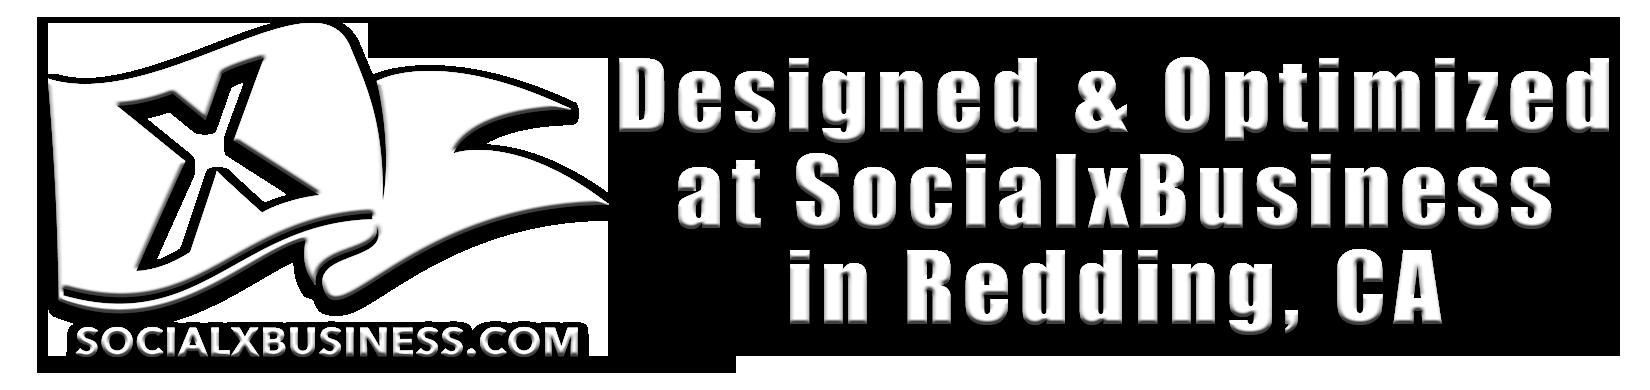 SocialxBusiness Website Design Optimization.jpg